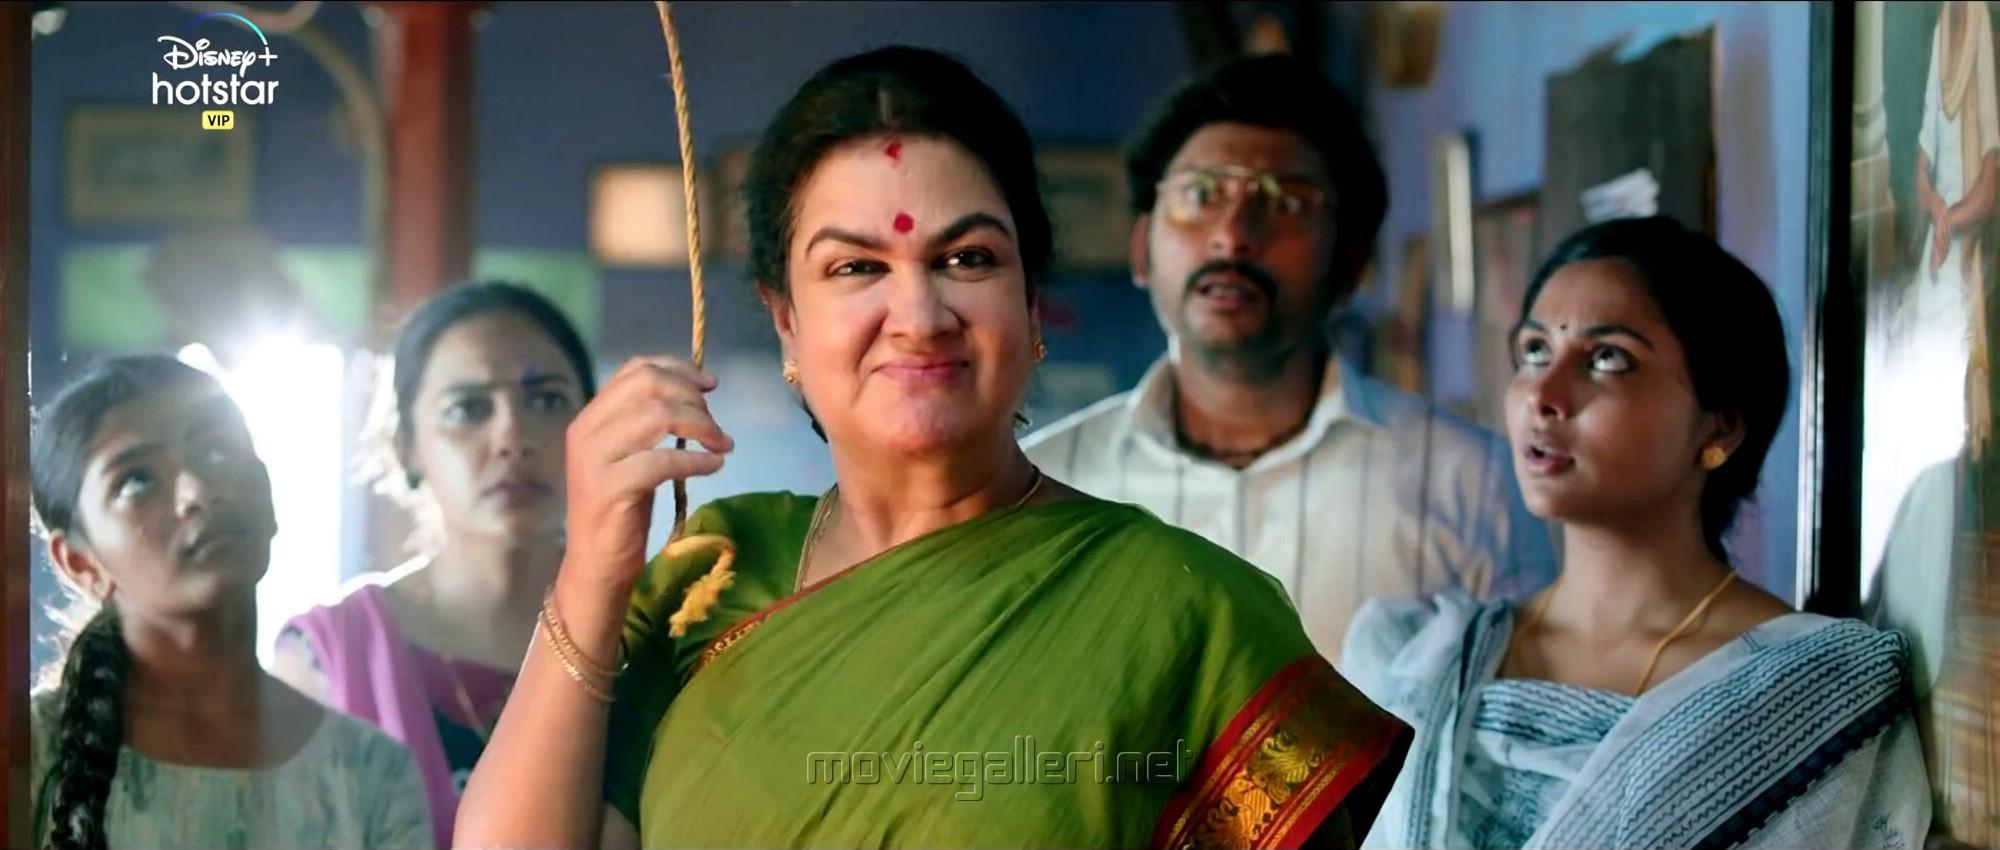 Nayanthara Mookuthi Amman Movie Images Hd Rj Balaji New Movie Posters